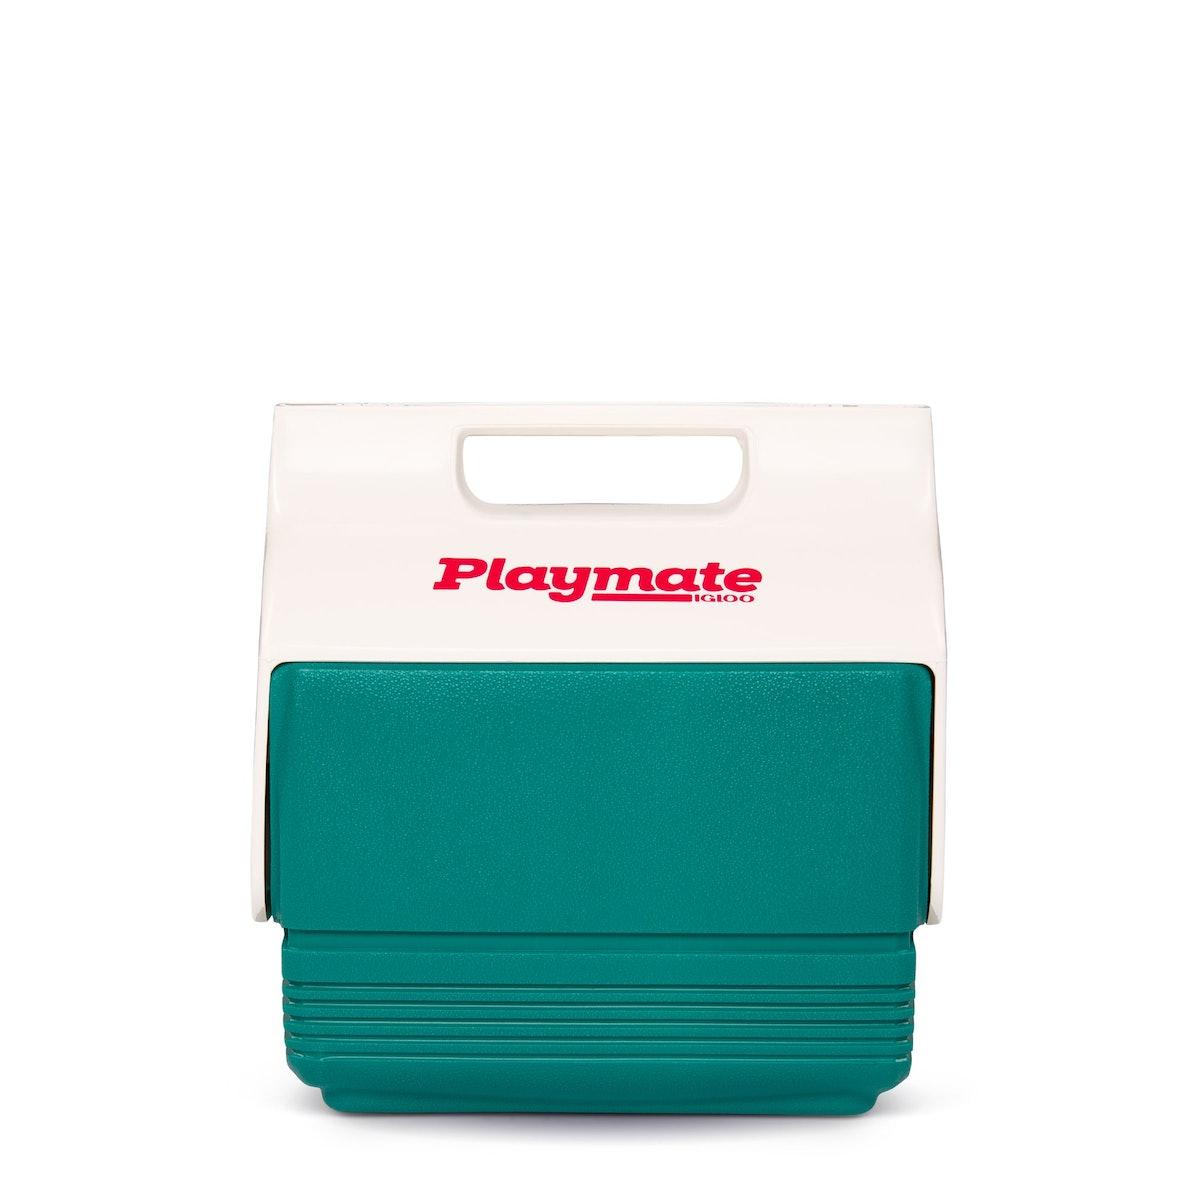 Retro Limited Edition Playmate Mini 4 Qt. Cooler